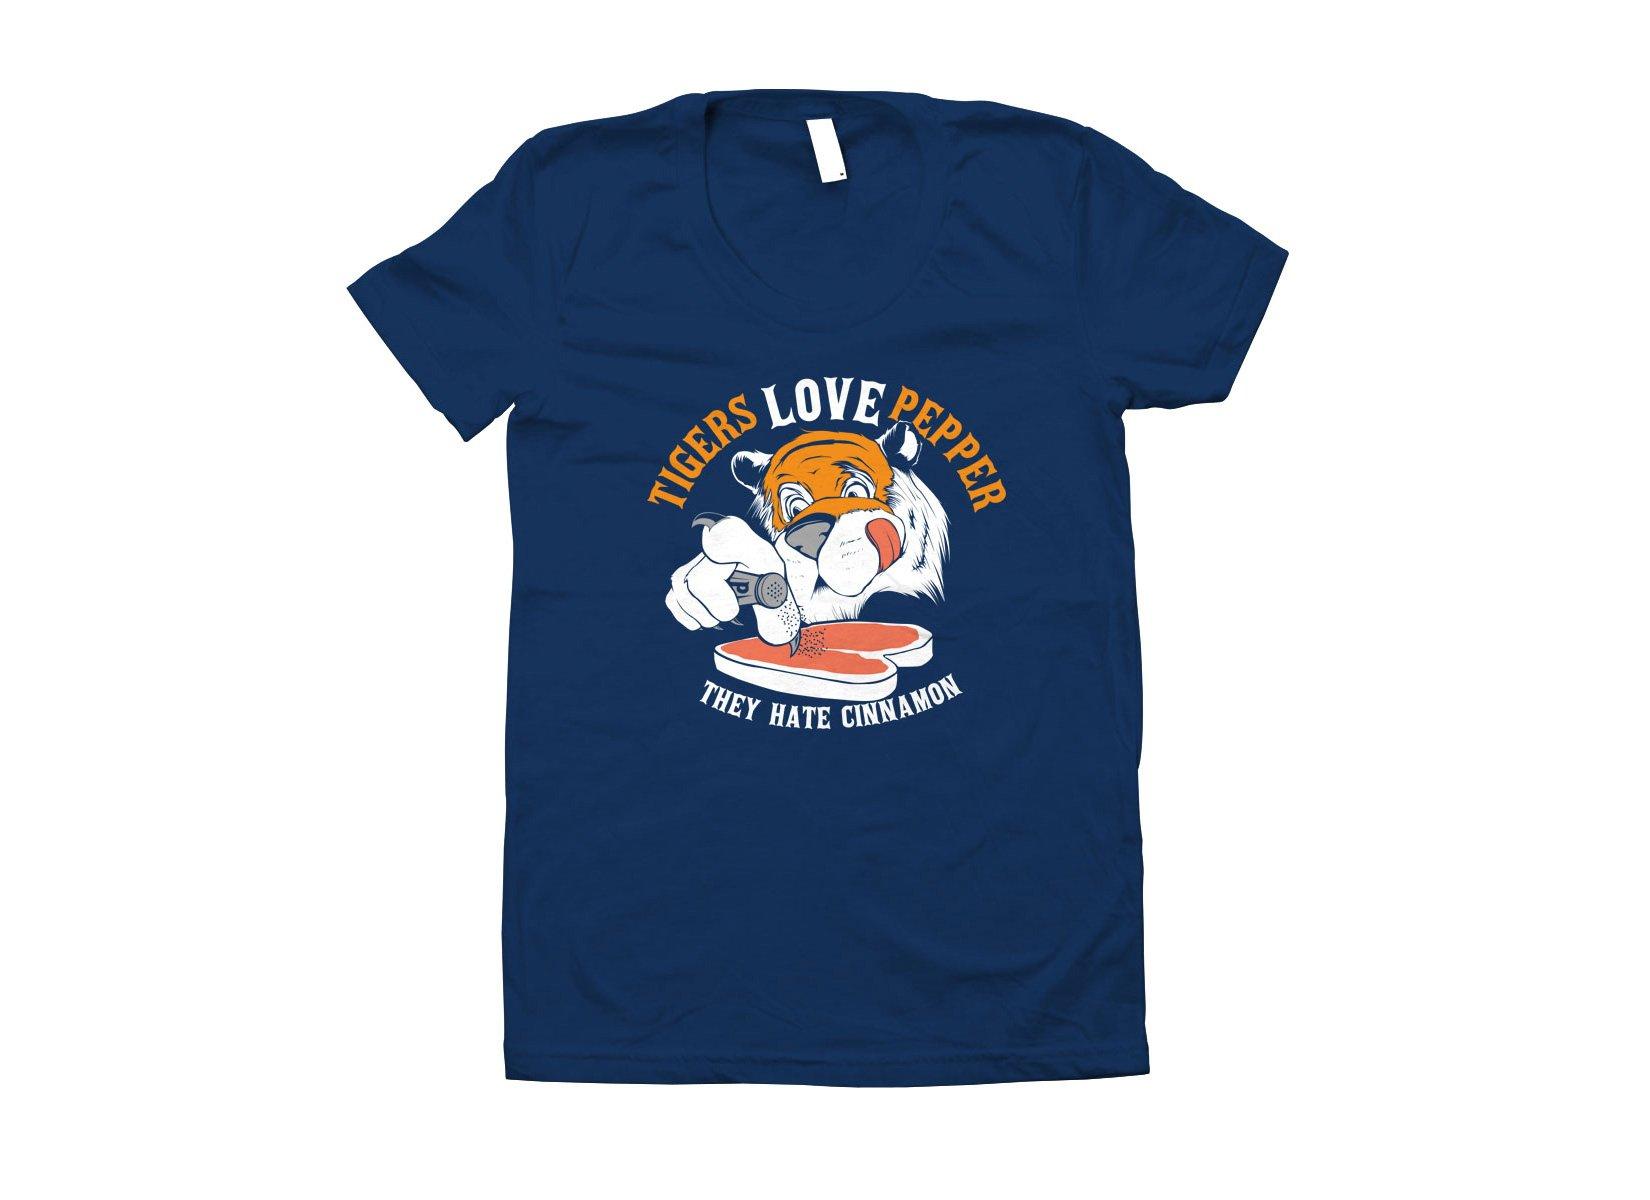 Tigers Love Pepper on Juniors T-Shirt